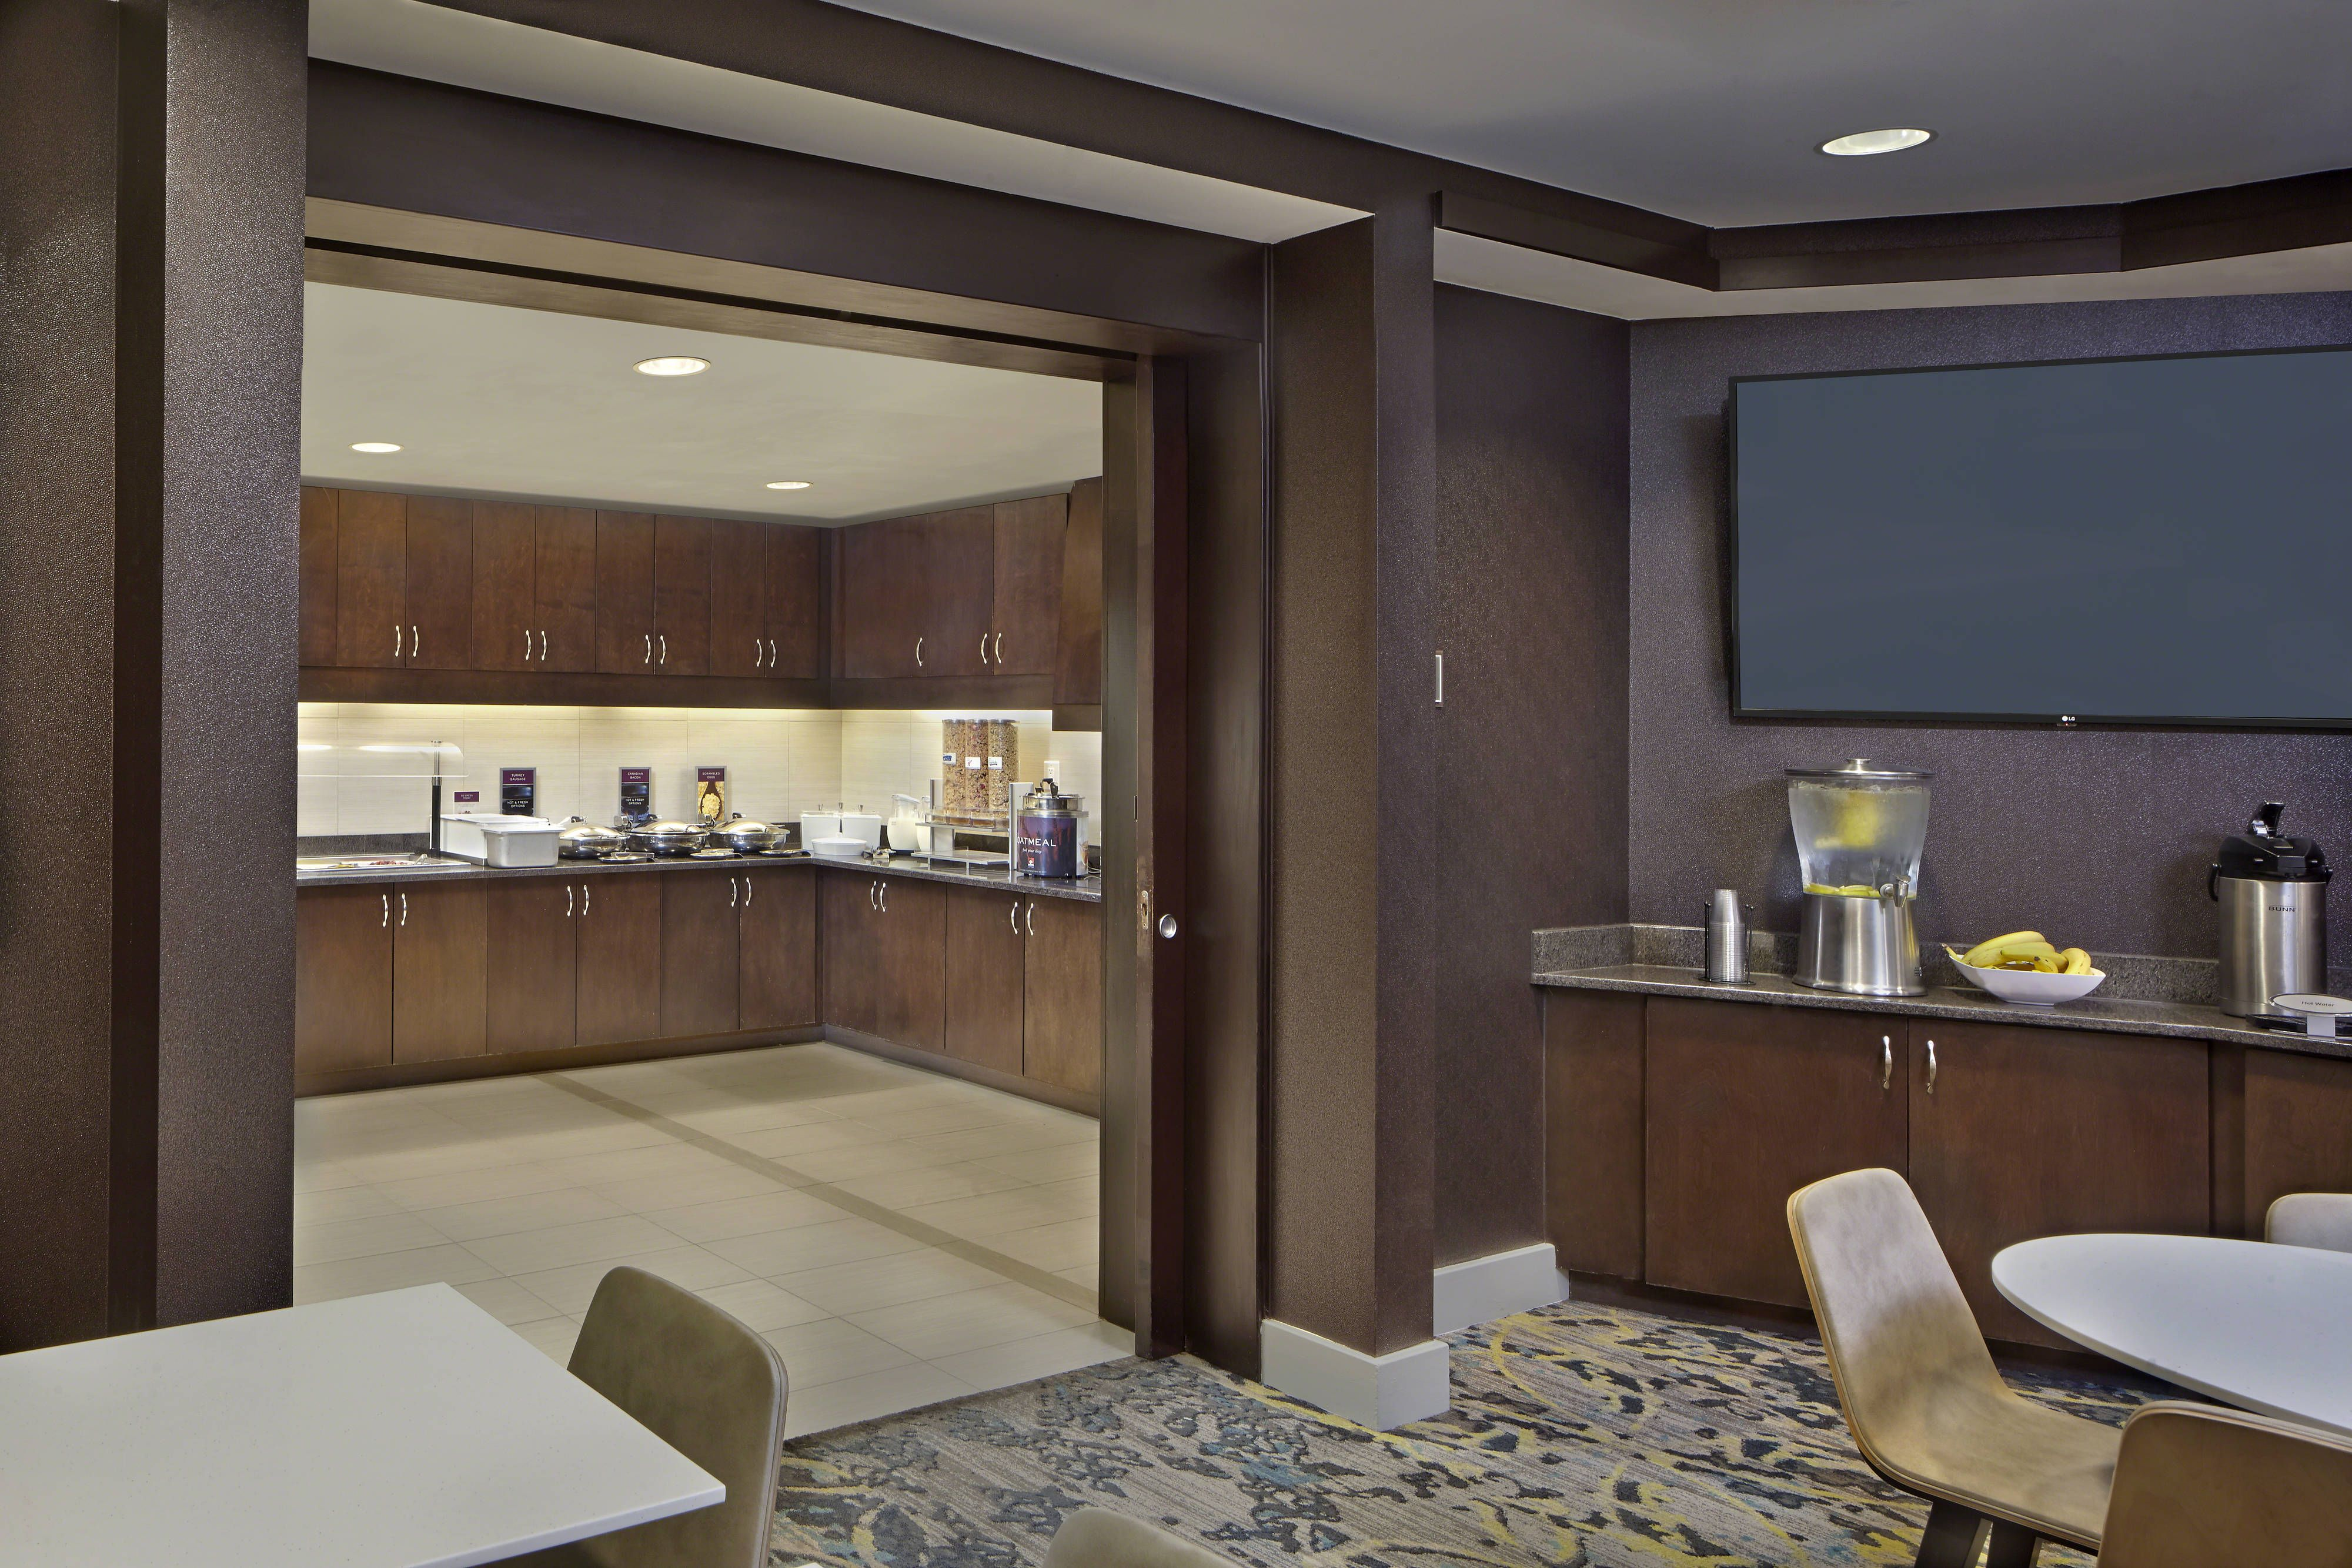 8a2ef5b480e39fa8e560734f6713ca3f Hotels With Full Kitchens In Orlando